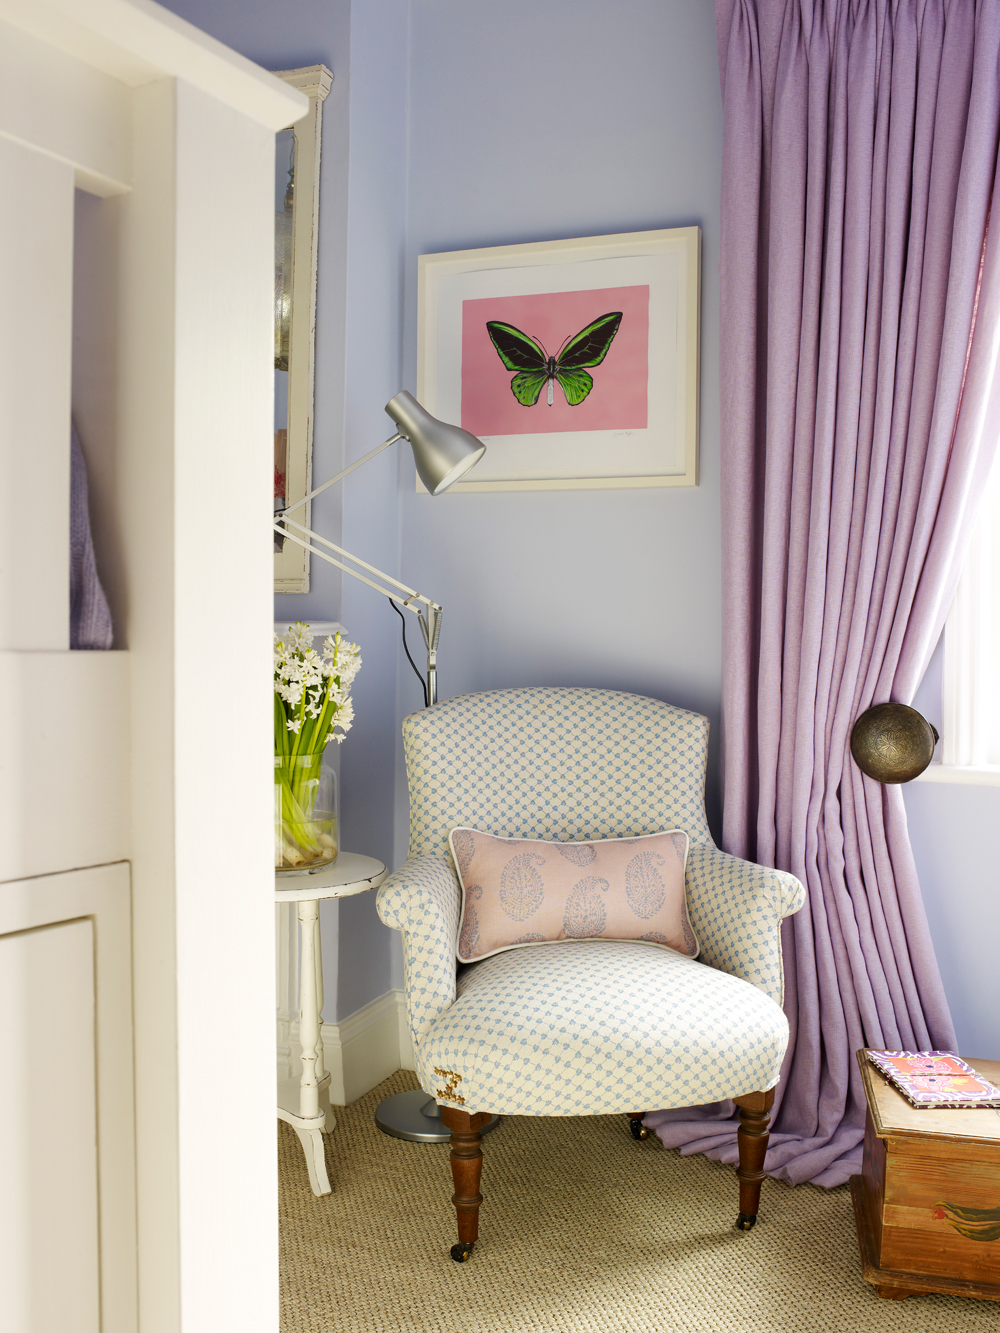 welche farbe kissen passen zu graue sofa. Black Bedroom Furniture Sets. Home Design Ideas